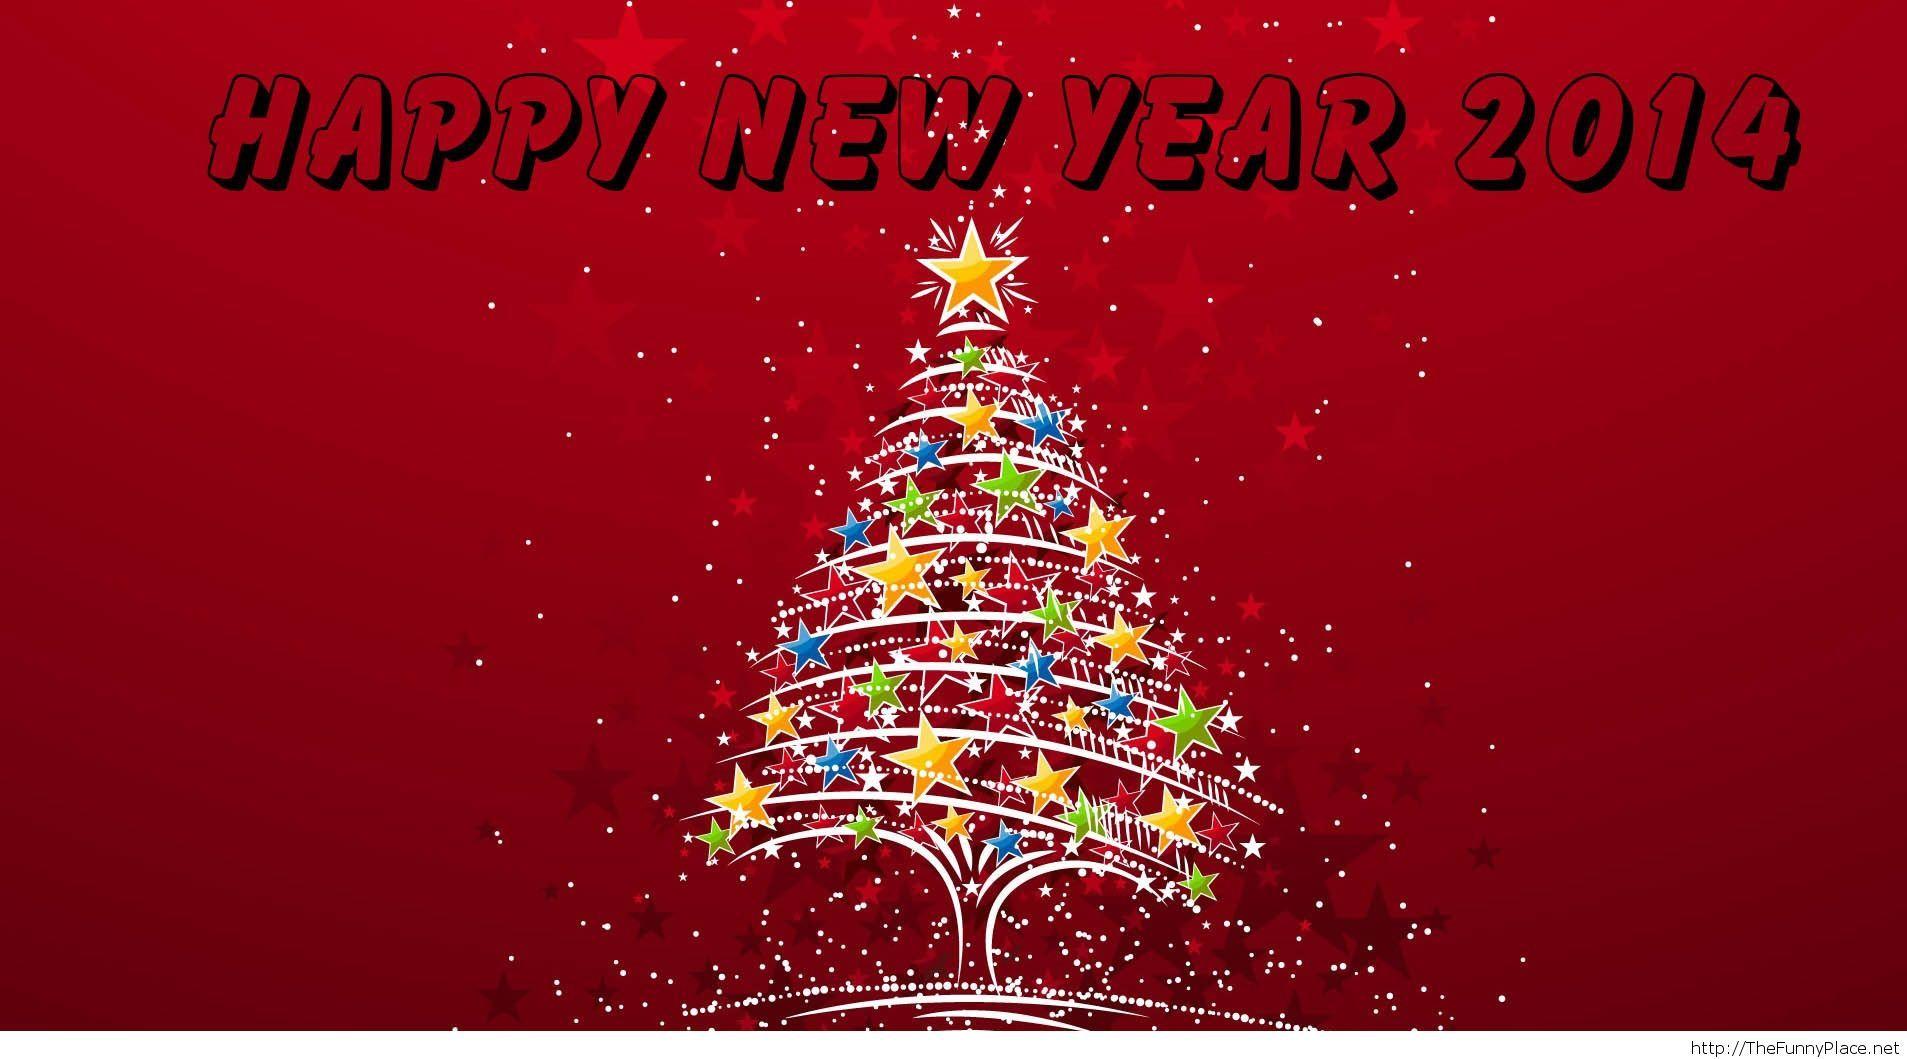 Happy new year 2014 photo